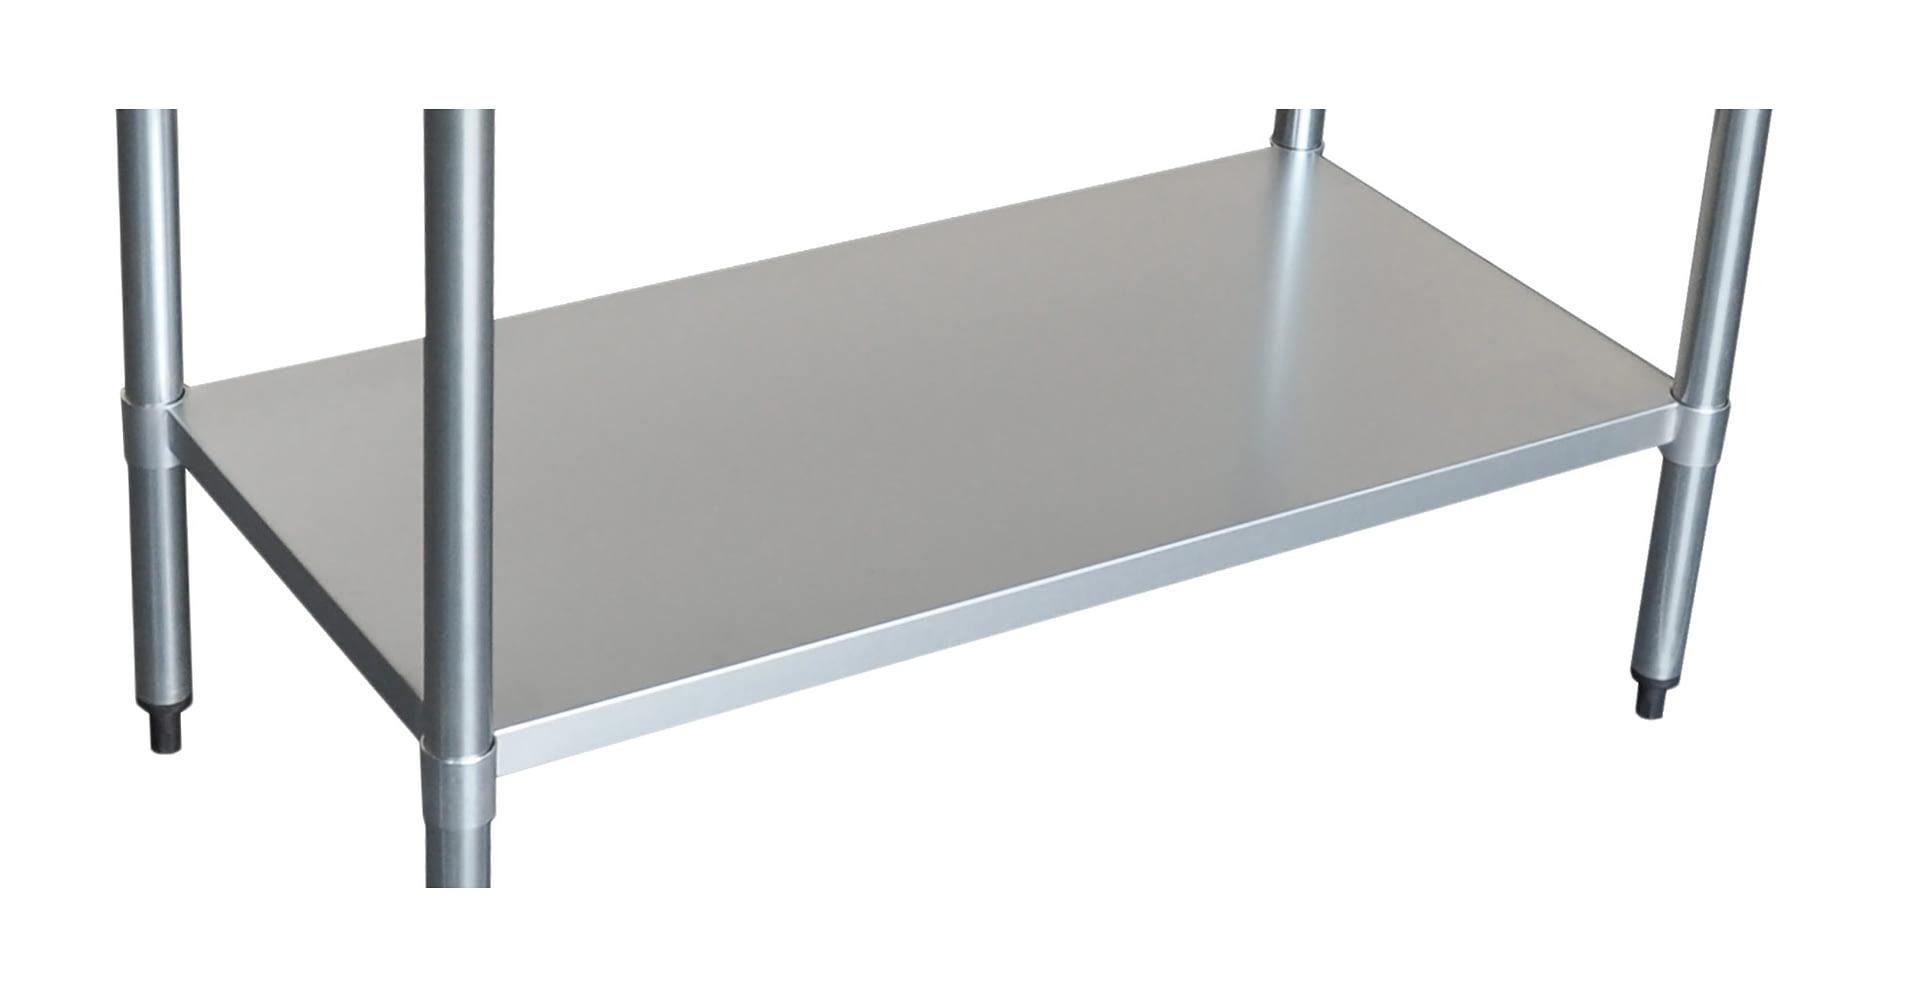 Stainless Undershelf for 3084 Bench